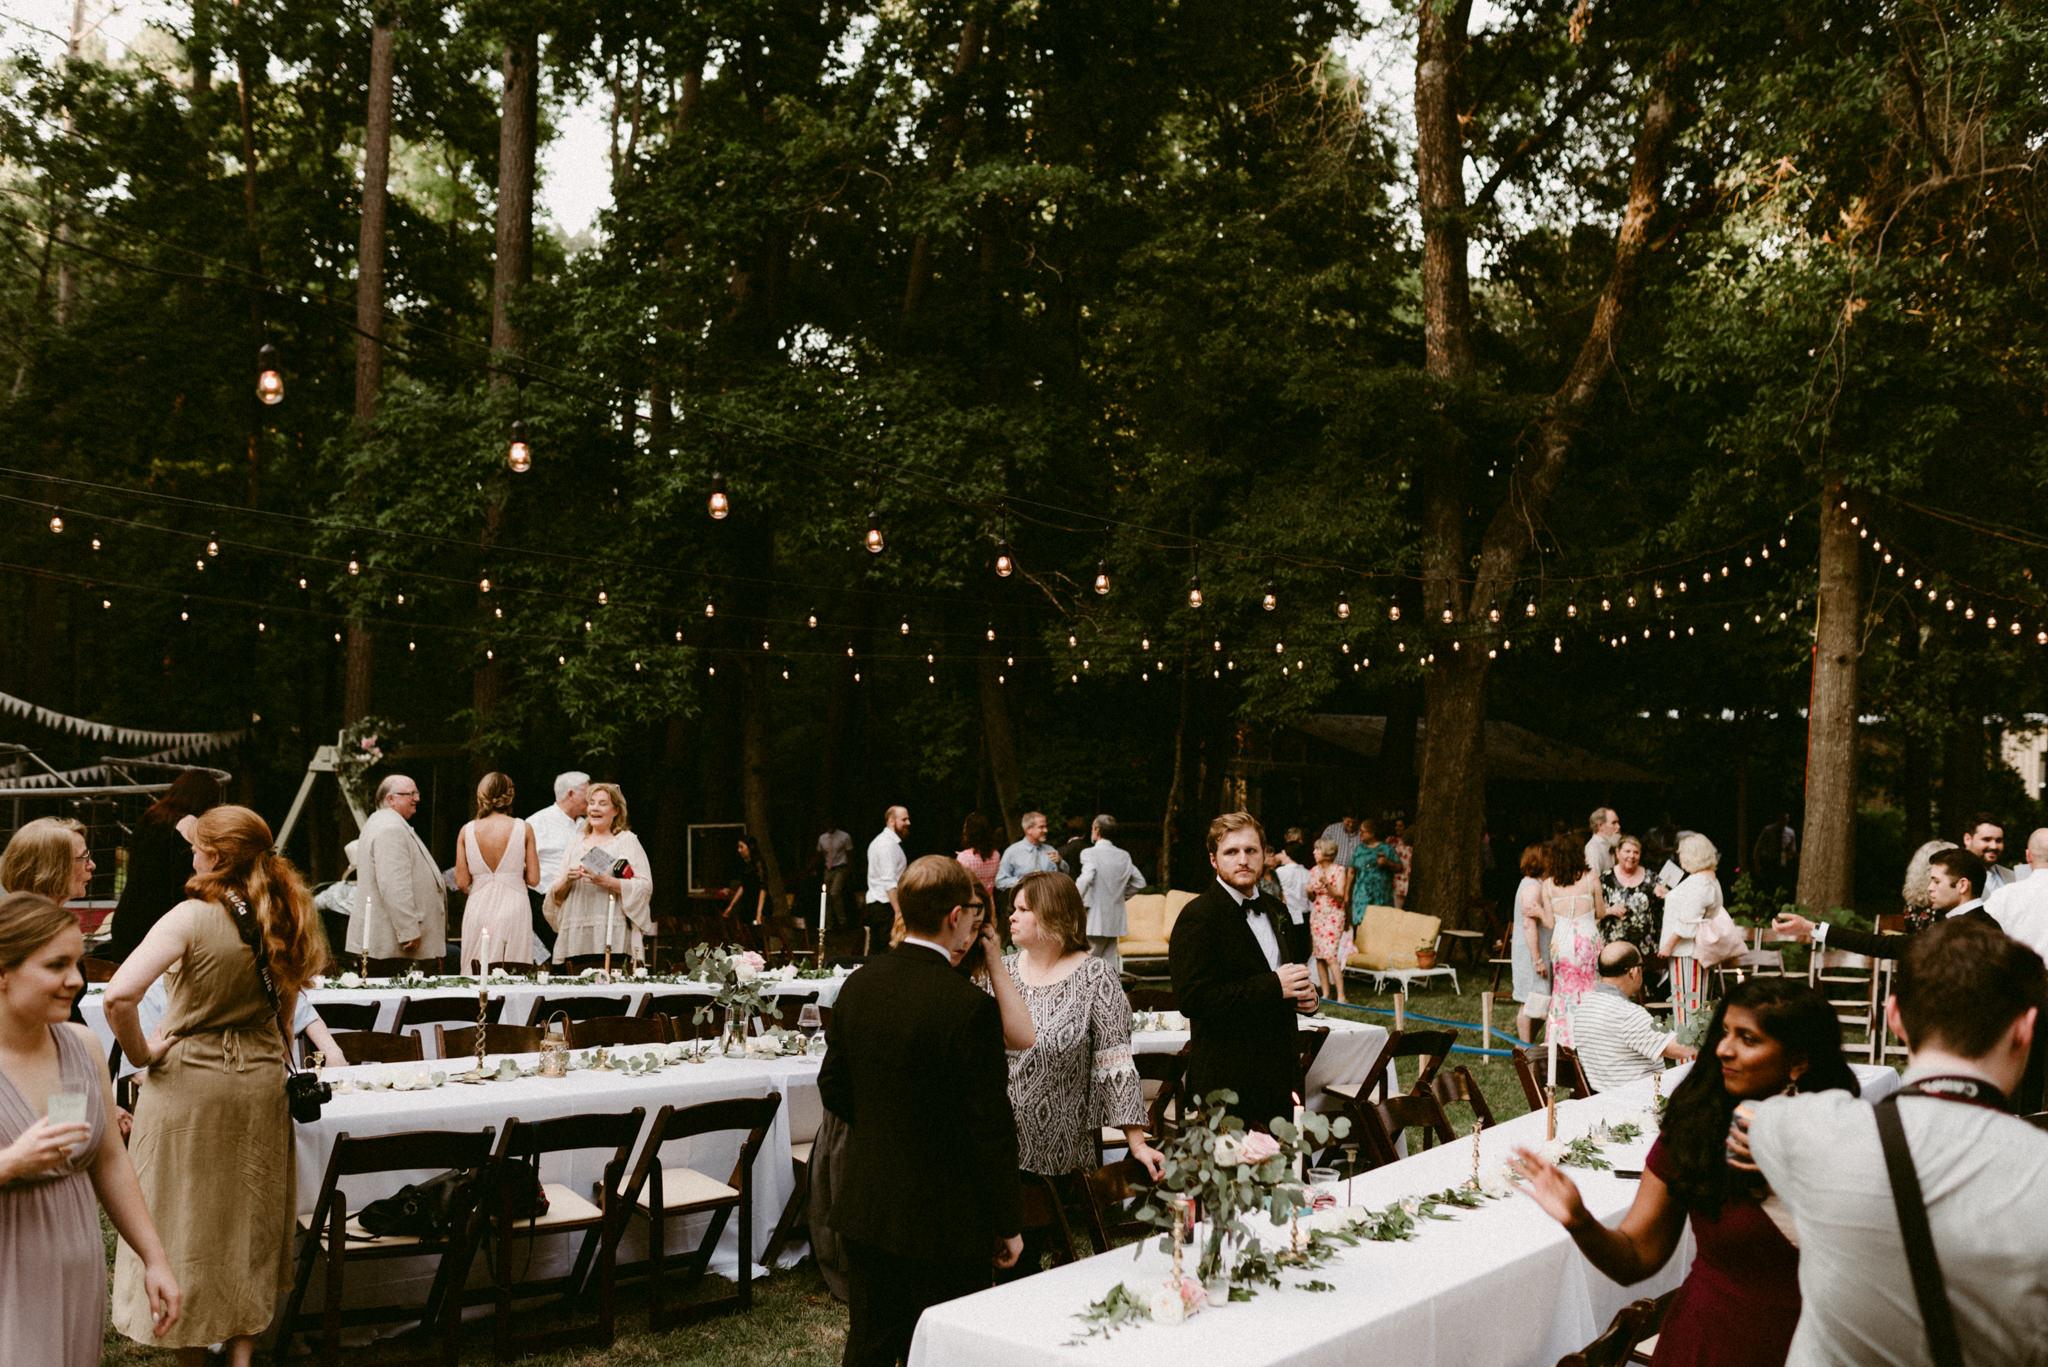 Kerlyn-Van-Gelder-Photography-Texas-Photographer541.jpgintimate-small-backyard-forest-wedding-nacogdoches-houston-wedding-photographer-kerlyn-van-gelder-photography